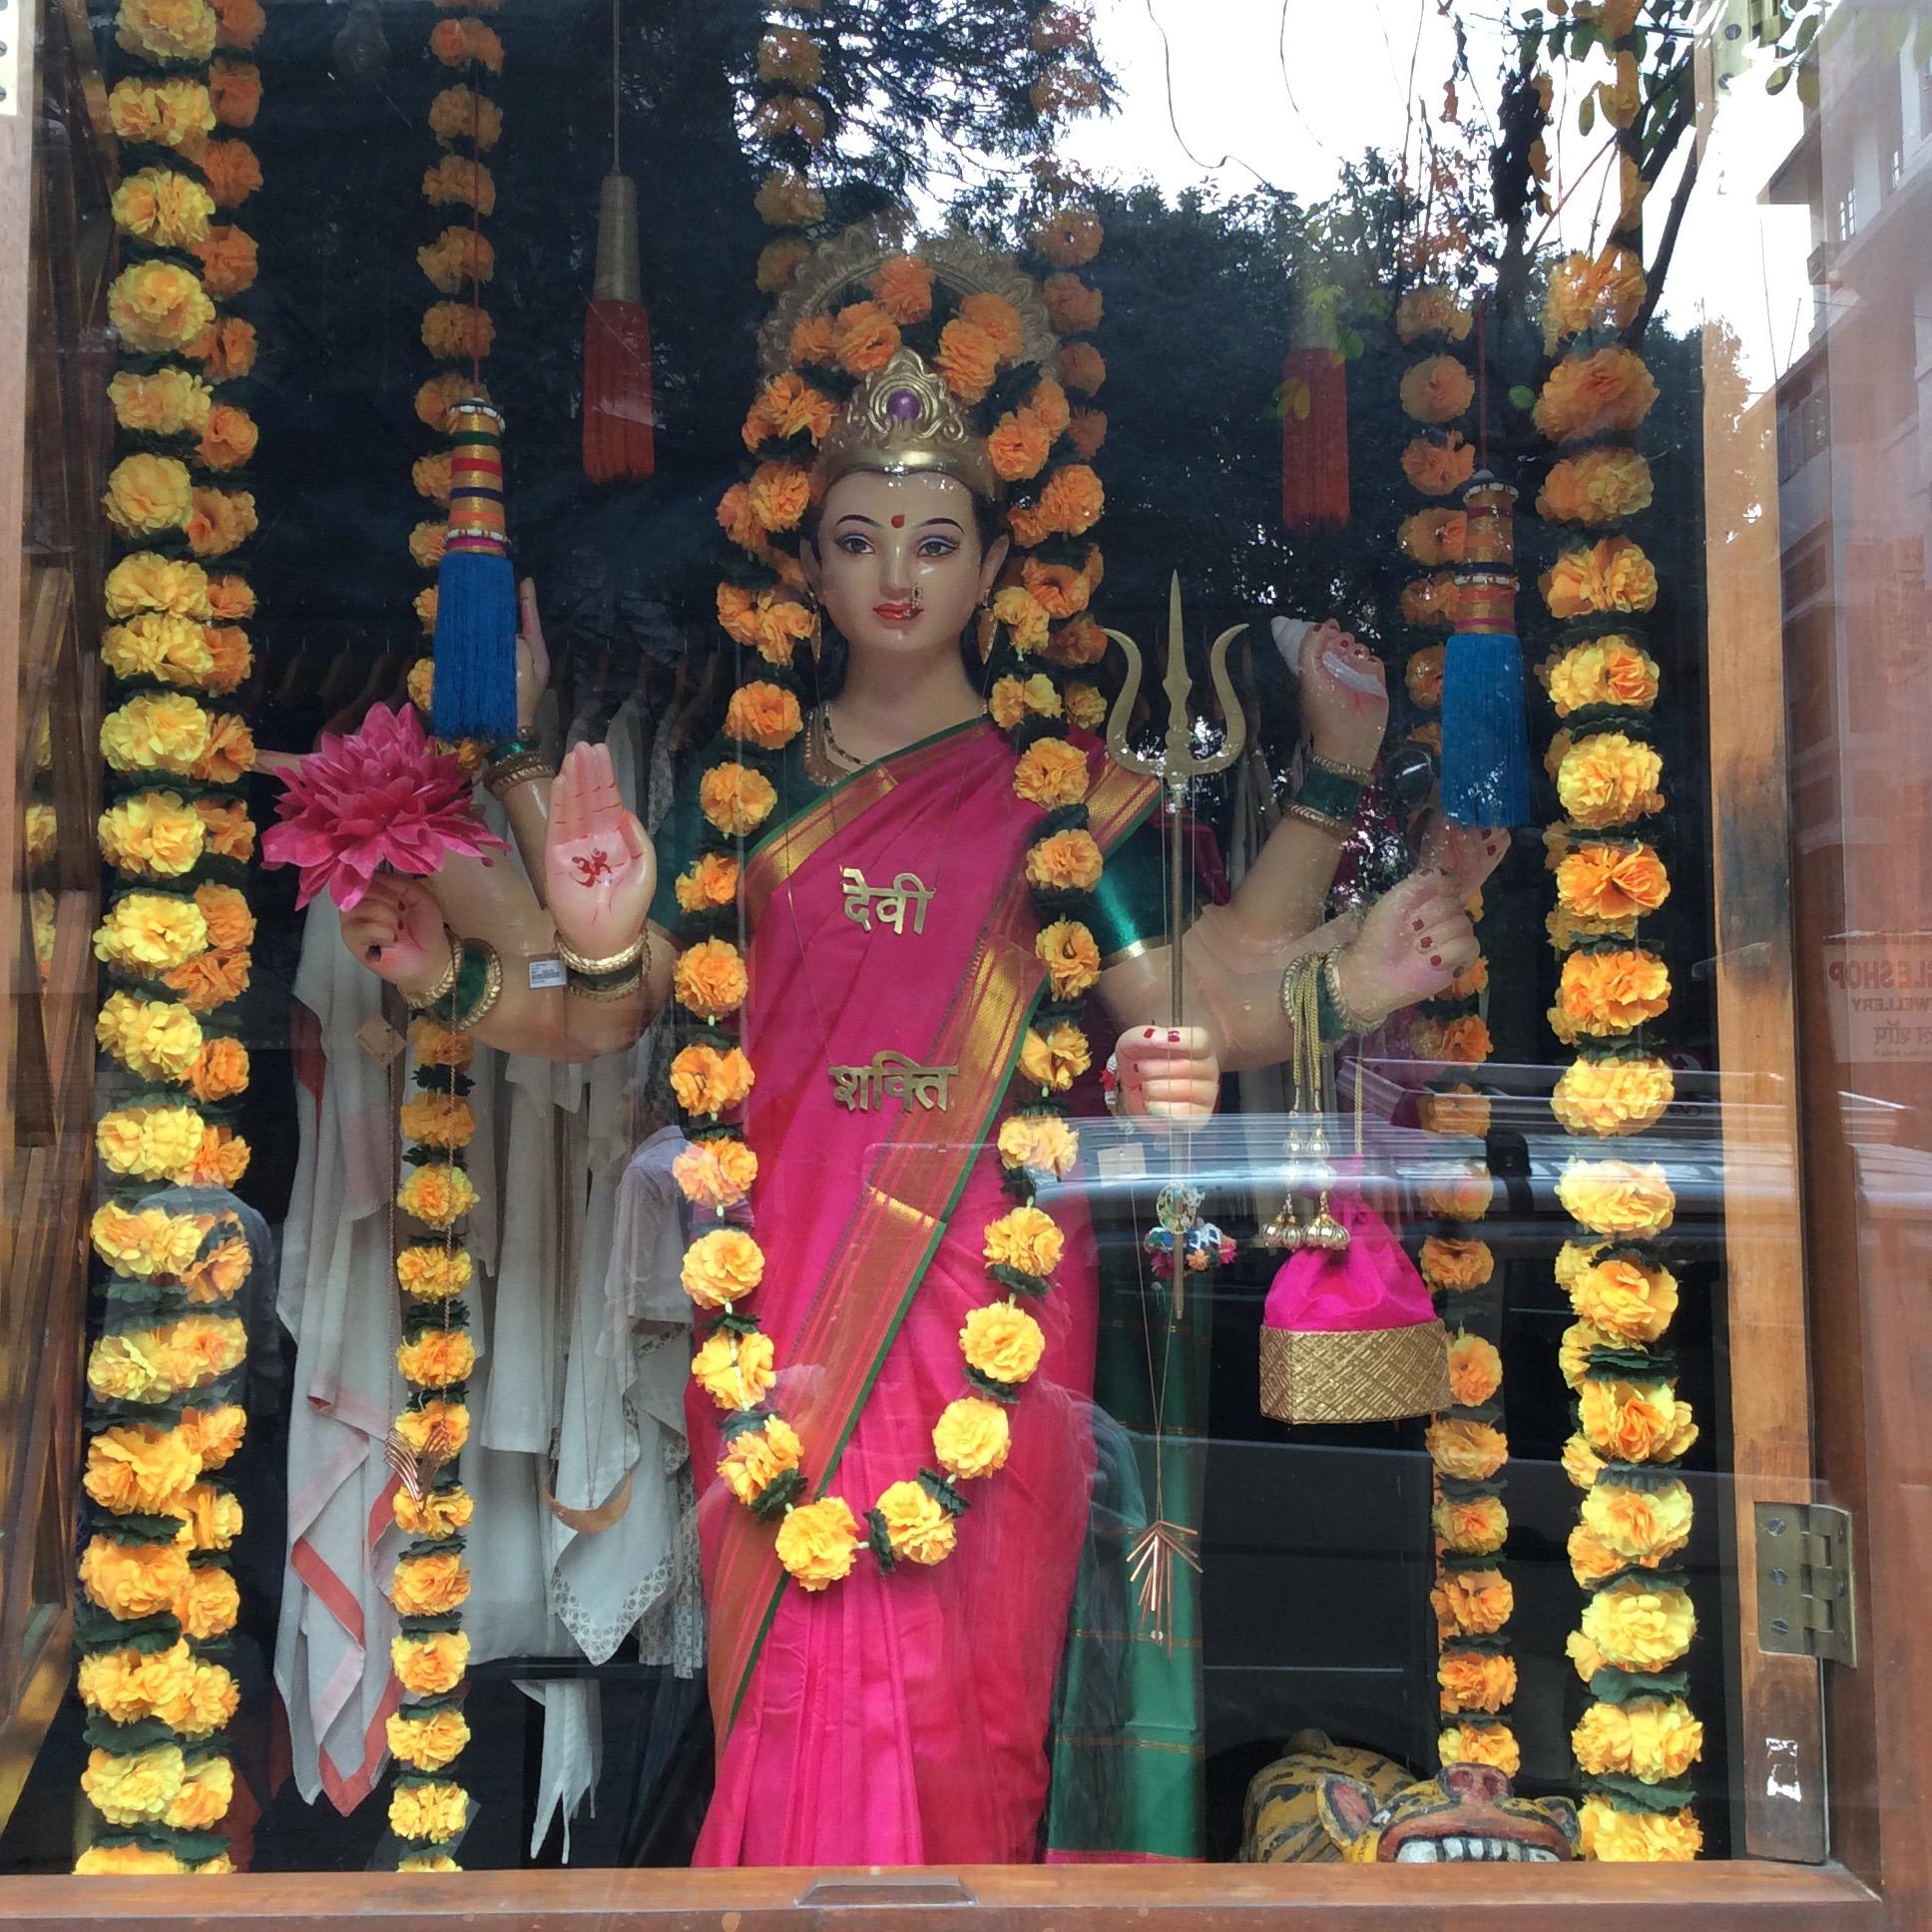 Maa Lakshmi: The Hindu Goddess of Prosperity. Unafraid to wear pink!